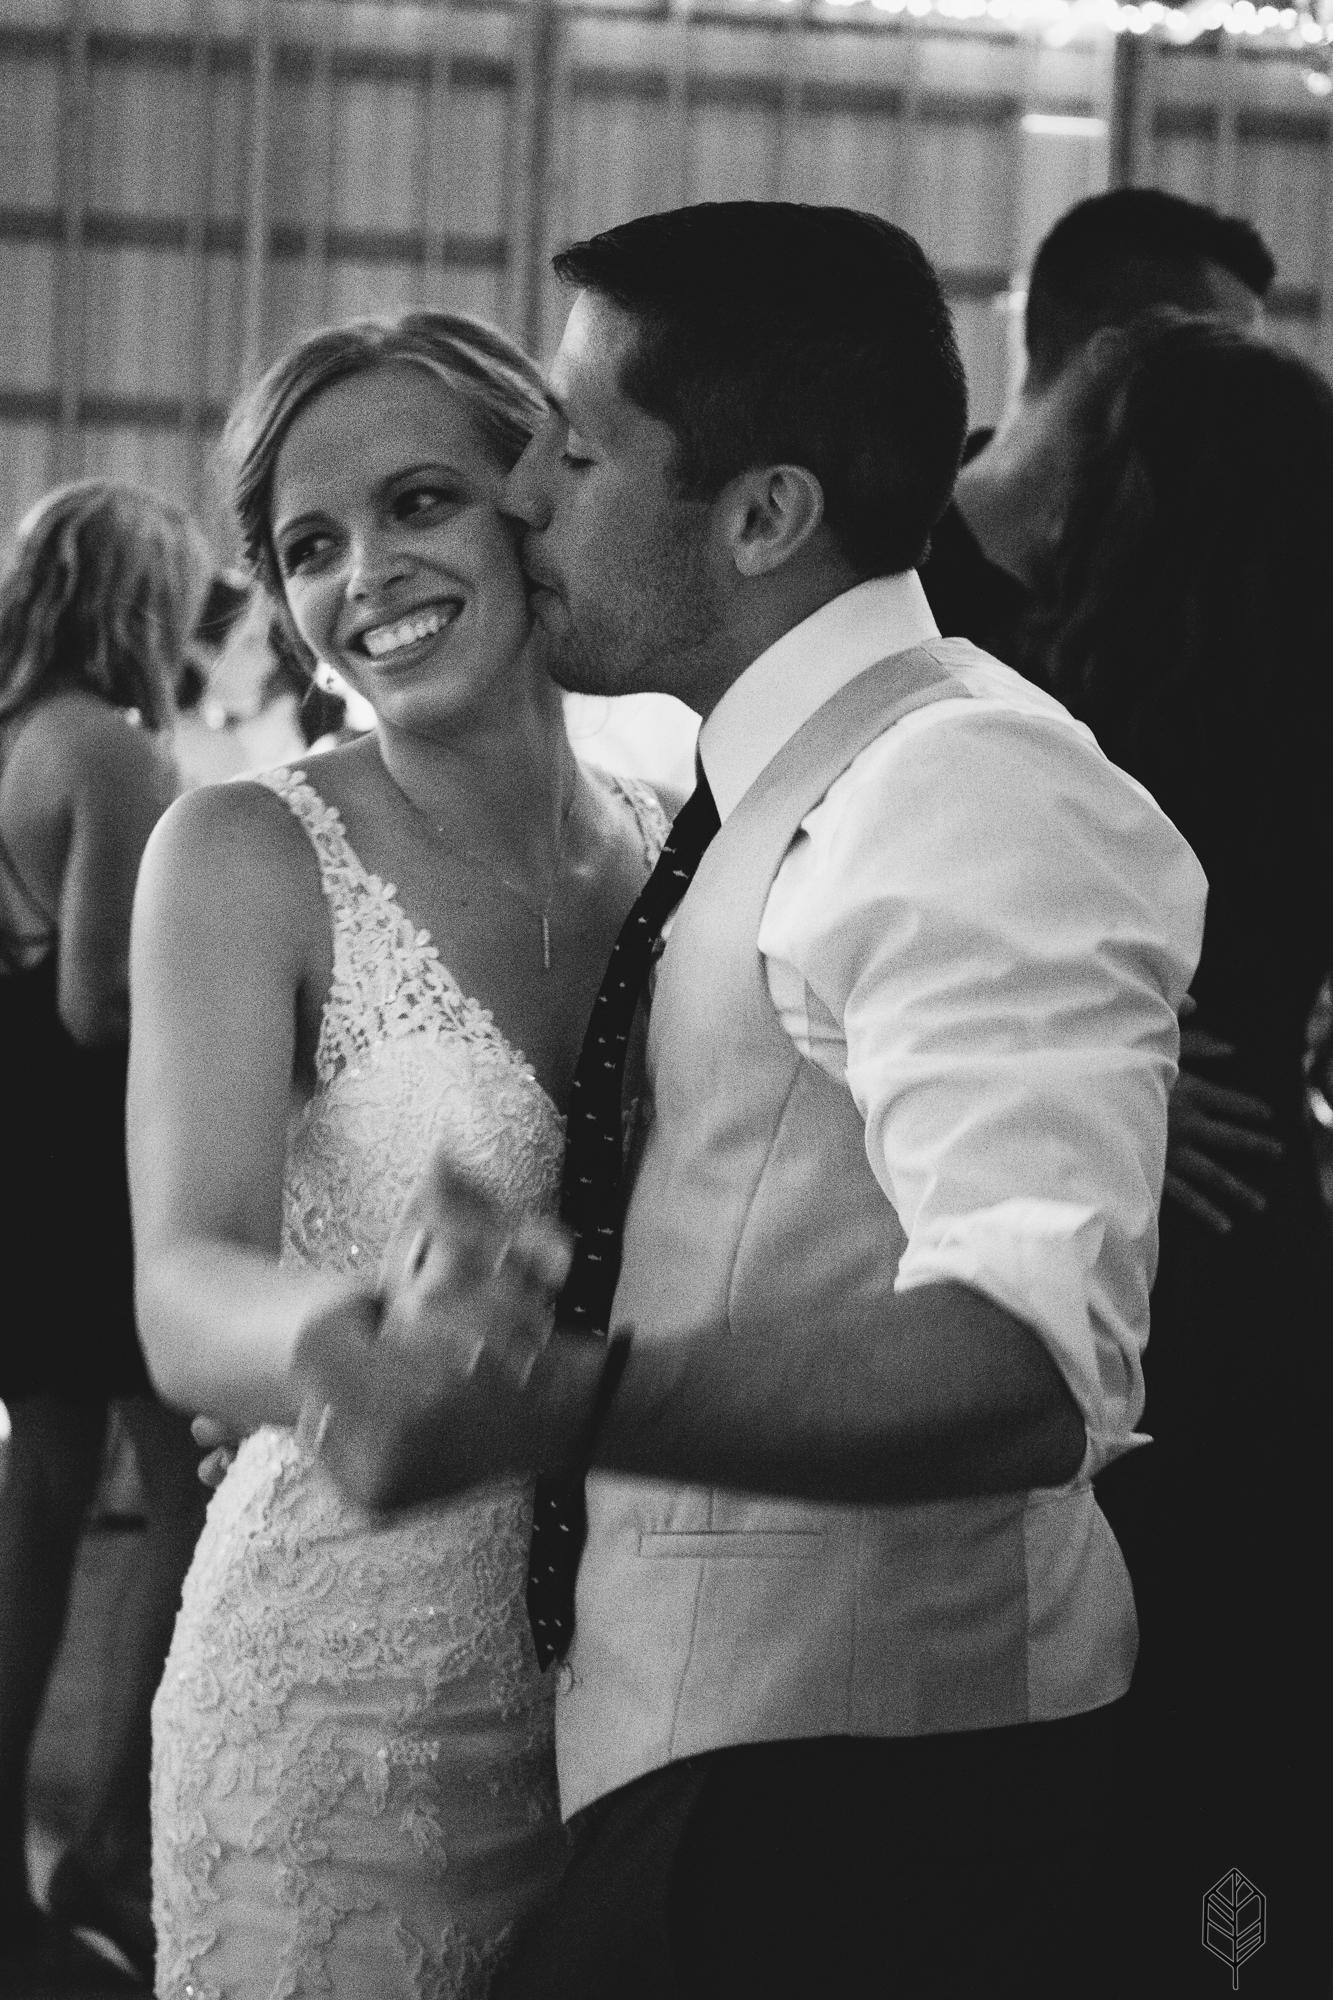 johnsonscreative_Ambrosia_wedding-46.jpg